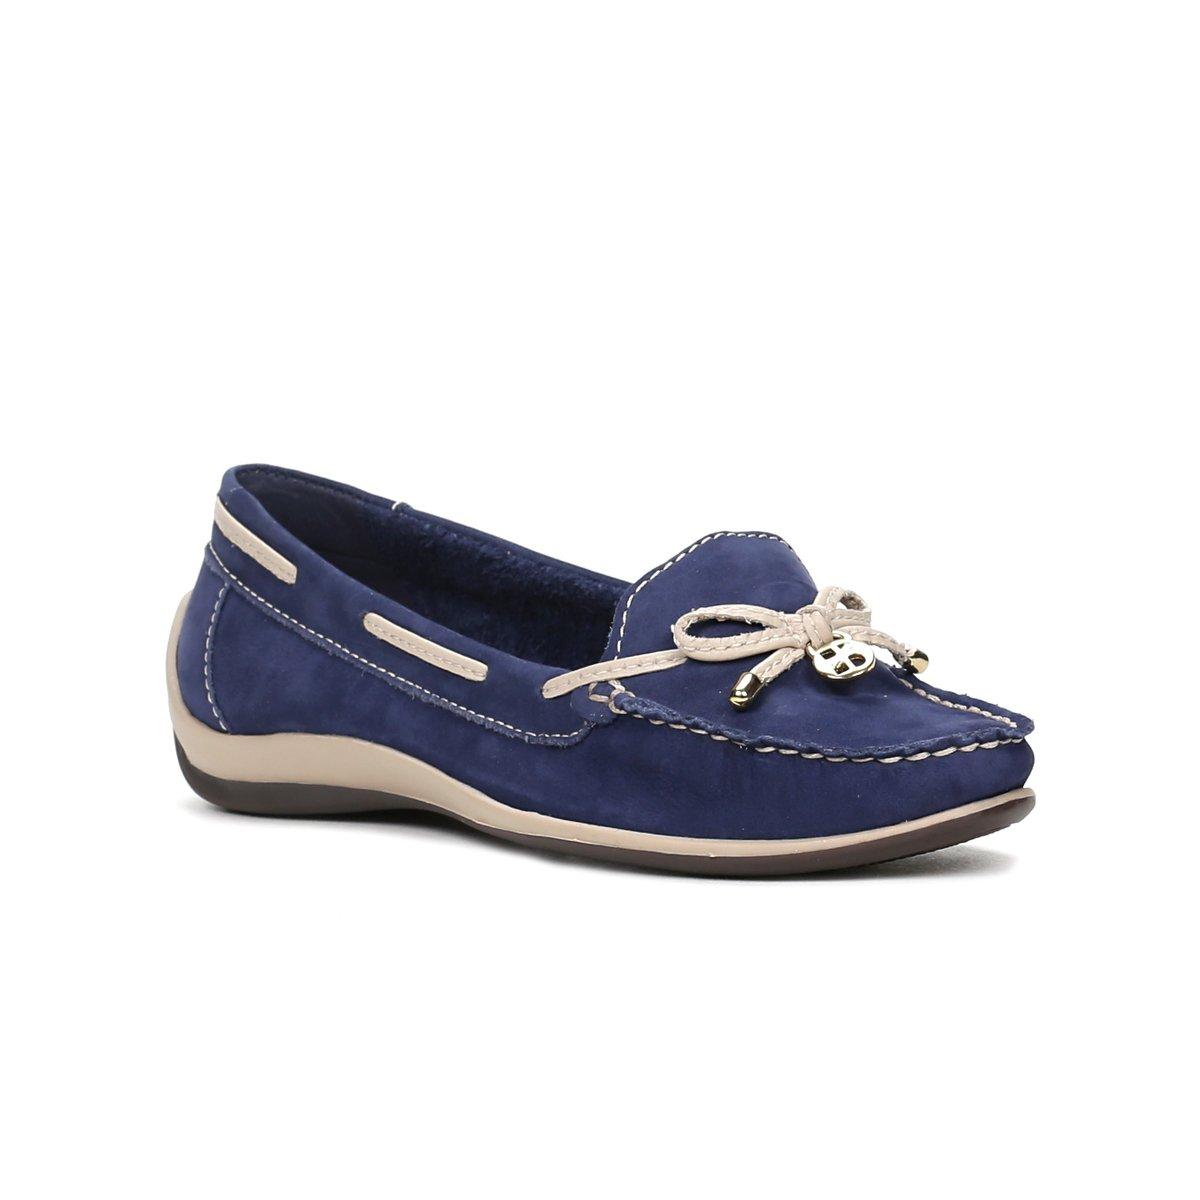 fd39ff7579 Mocassim Feminino Bottero Botocean Sider Azul bege - Compre Agora ...